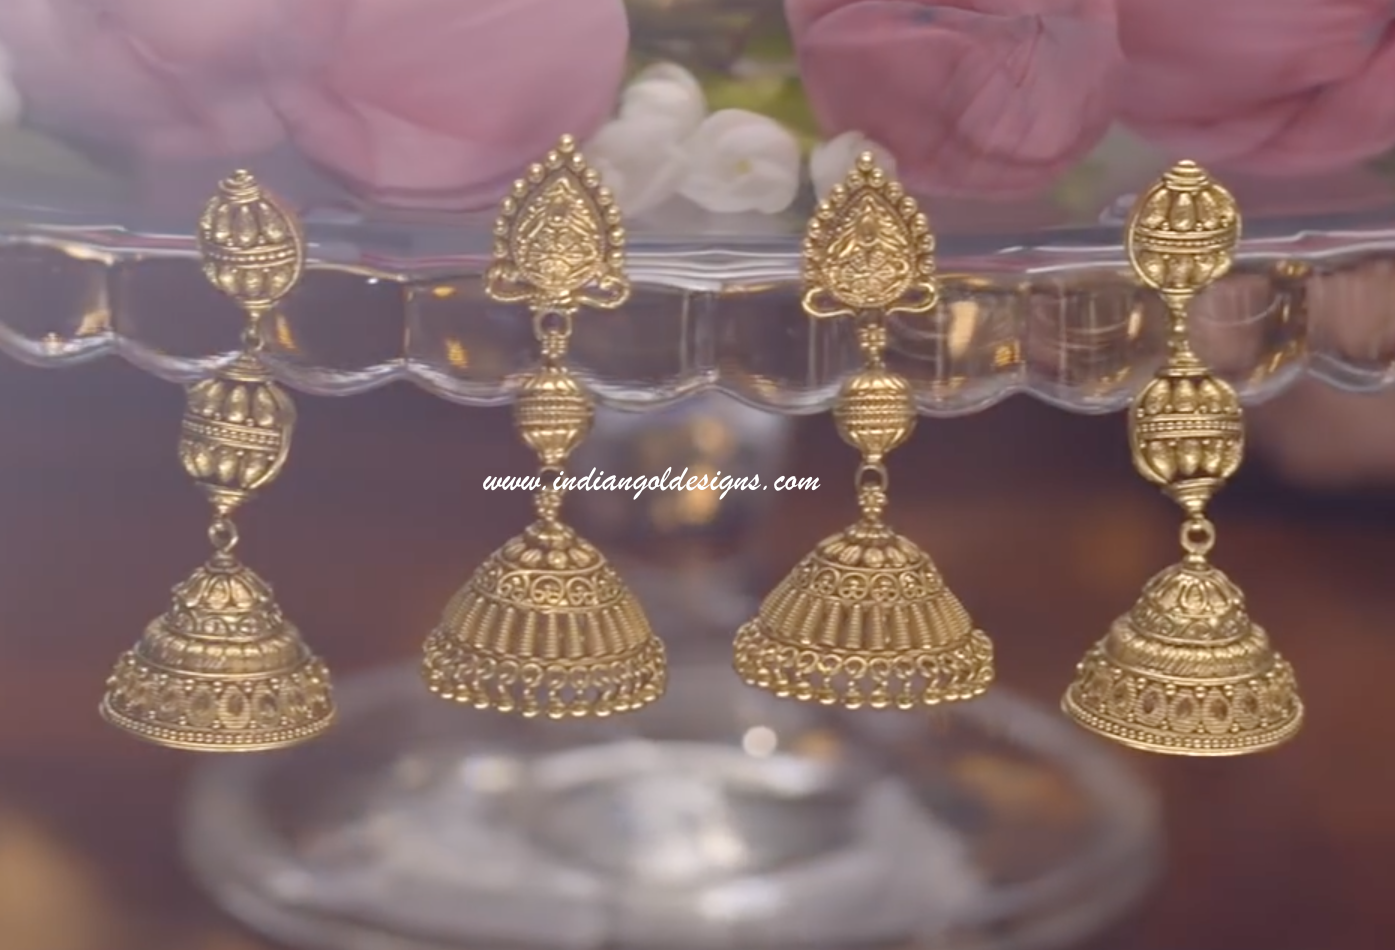 Watch - Jhumka gold designs from tanishq video